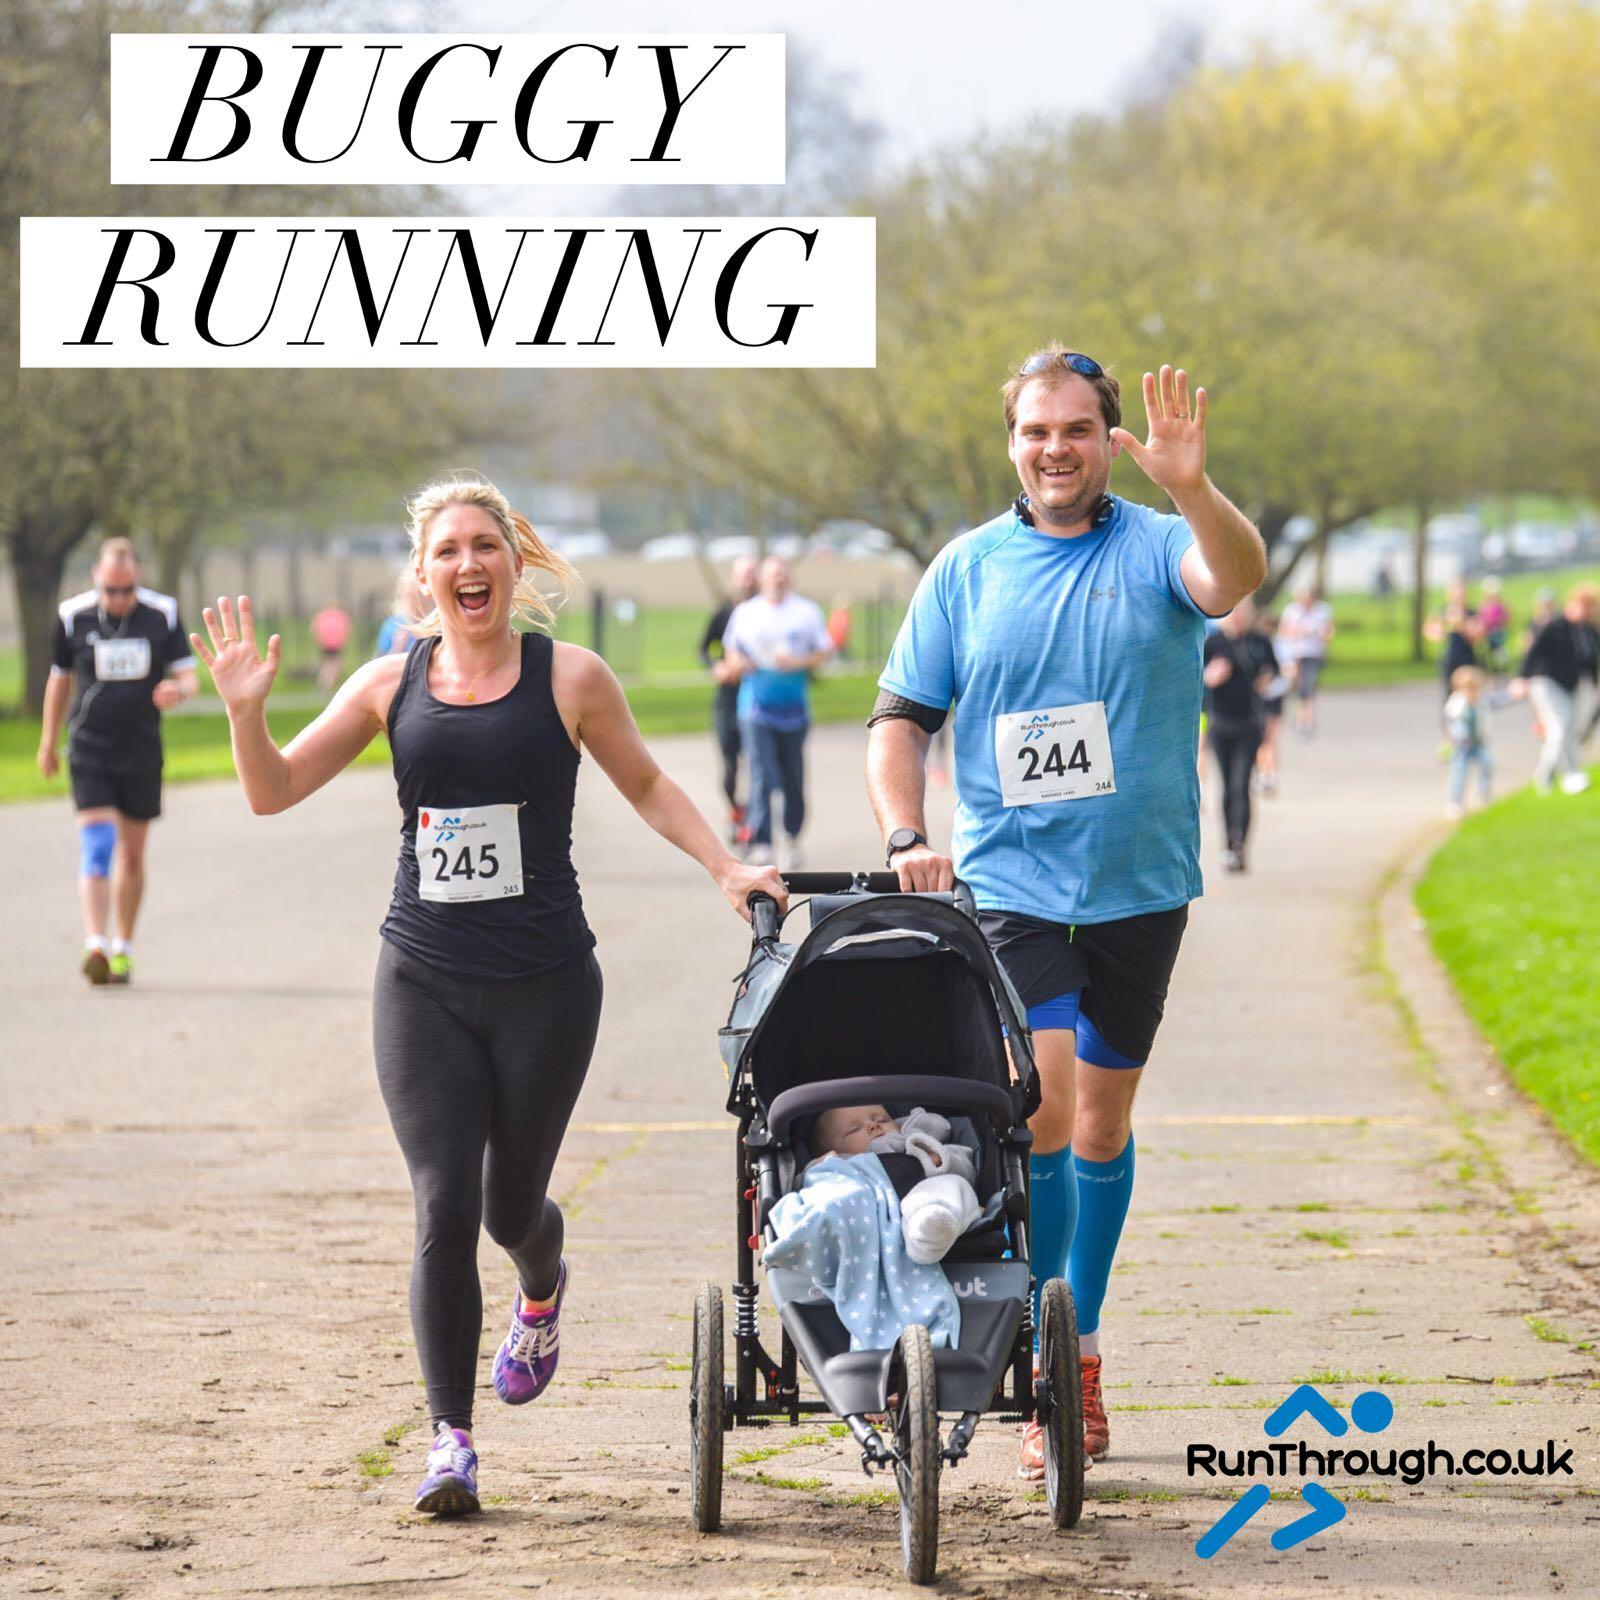 Buggy Running